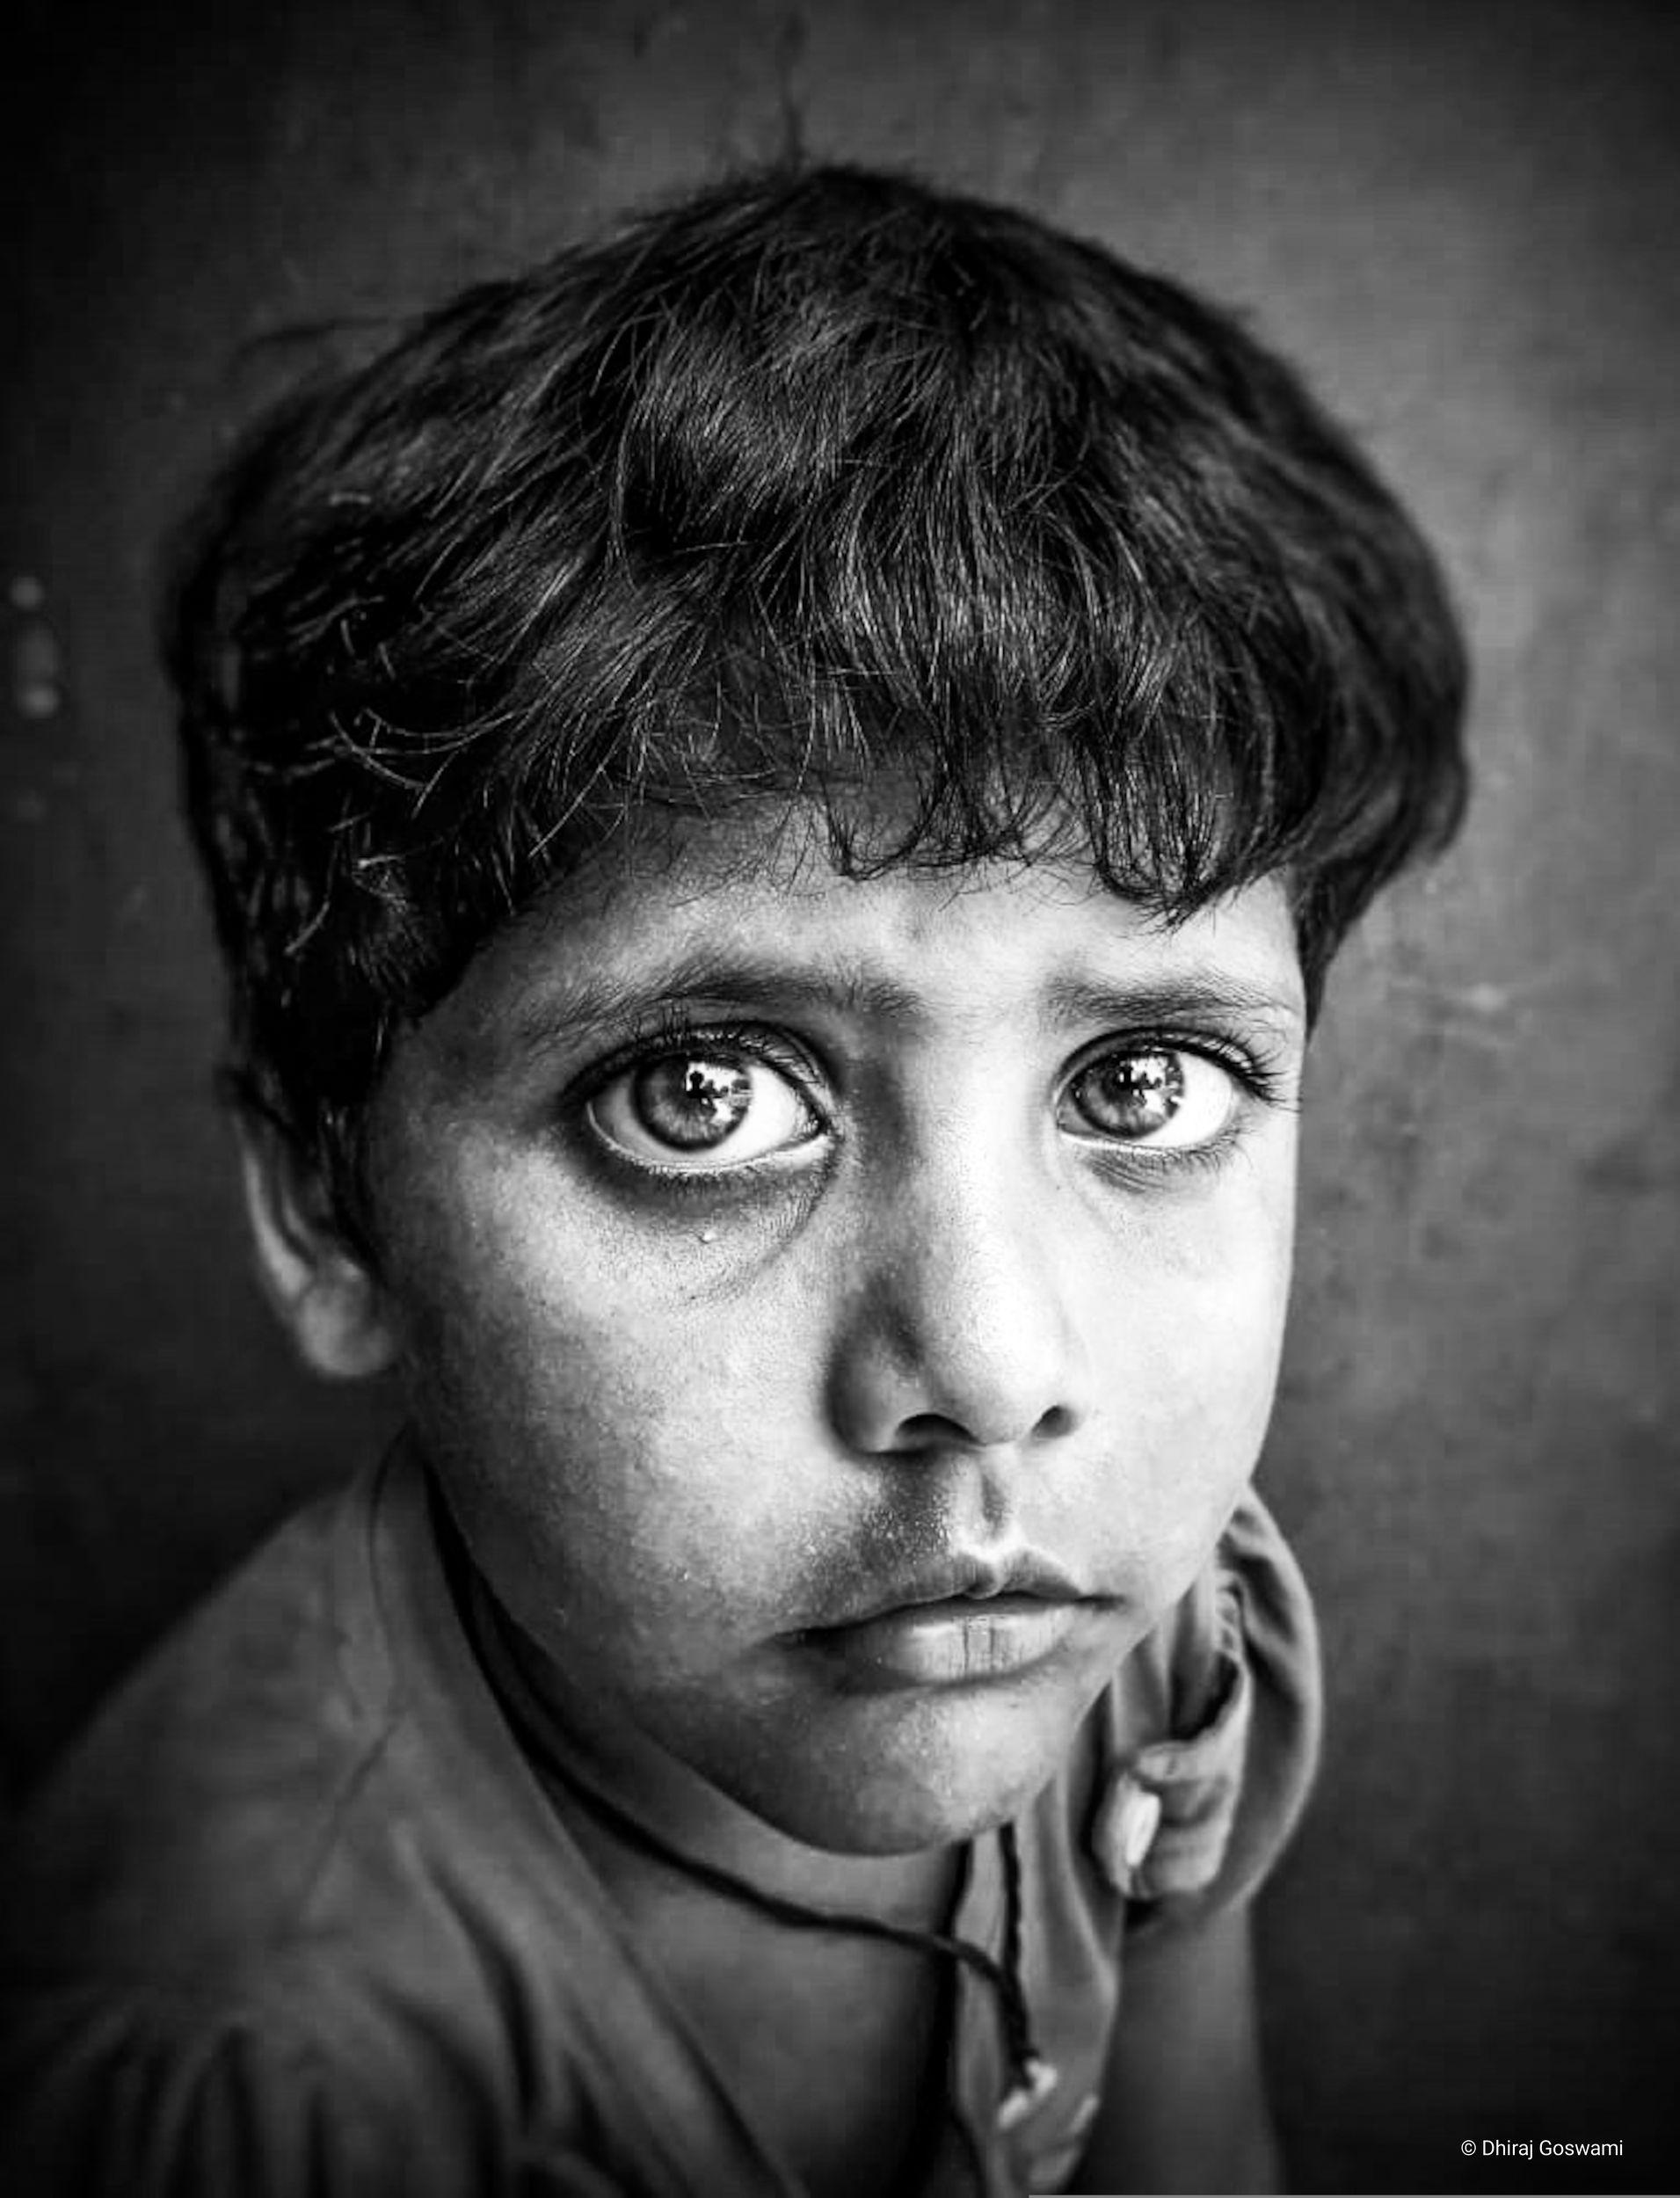 #Portraits, #portrait, #black-and-white, #bnw , #35photopro, #35photo, GOSWAMI DHIRAJ